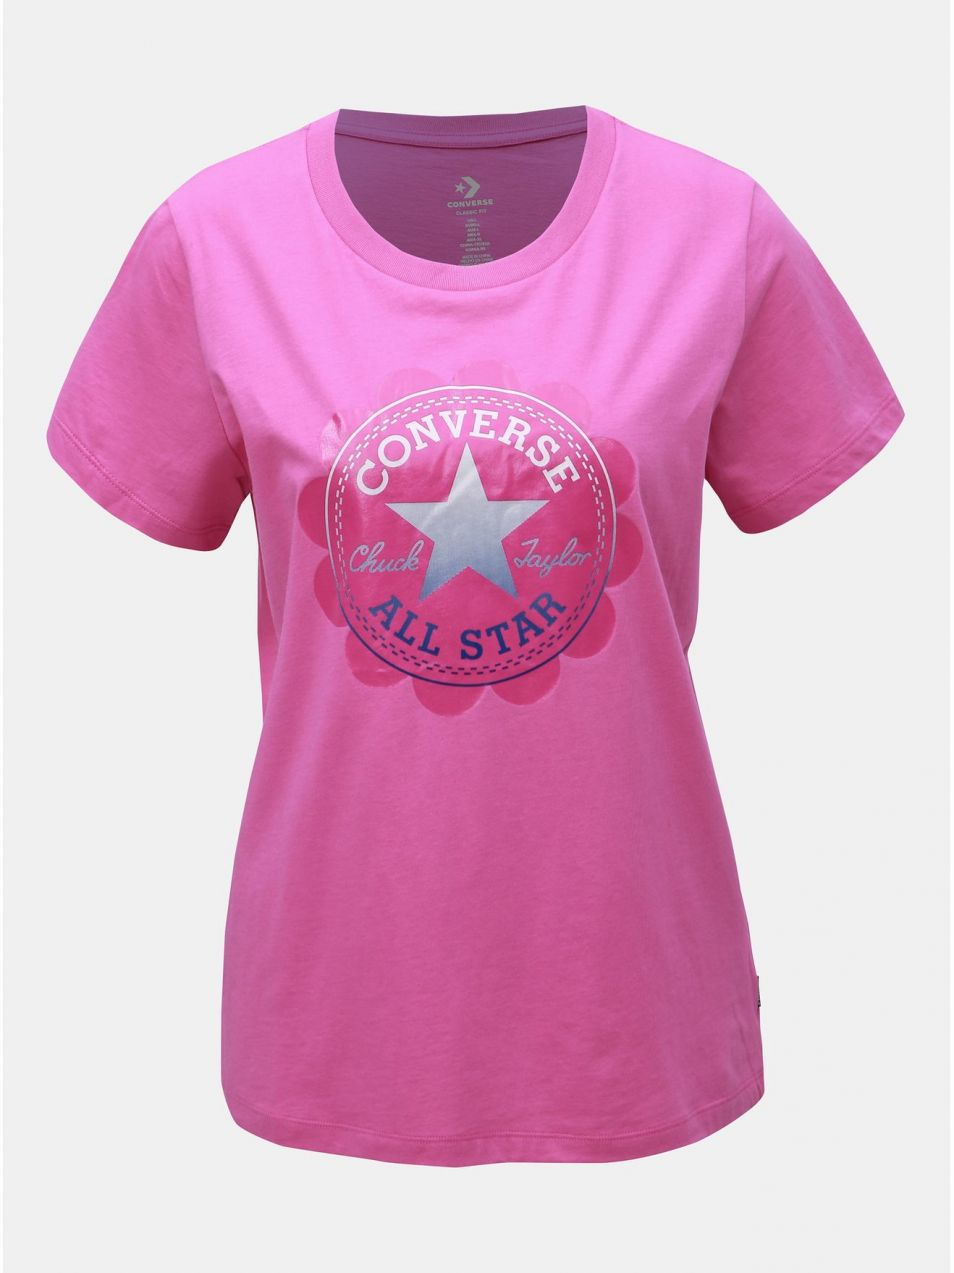 1340b4525d52 Ružové dámske tričko s potlačou Converse značky Converse - Lovely.sk